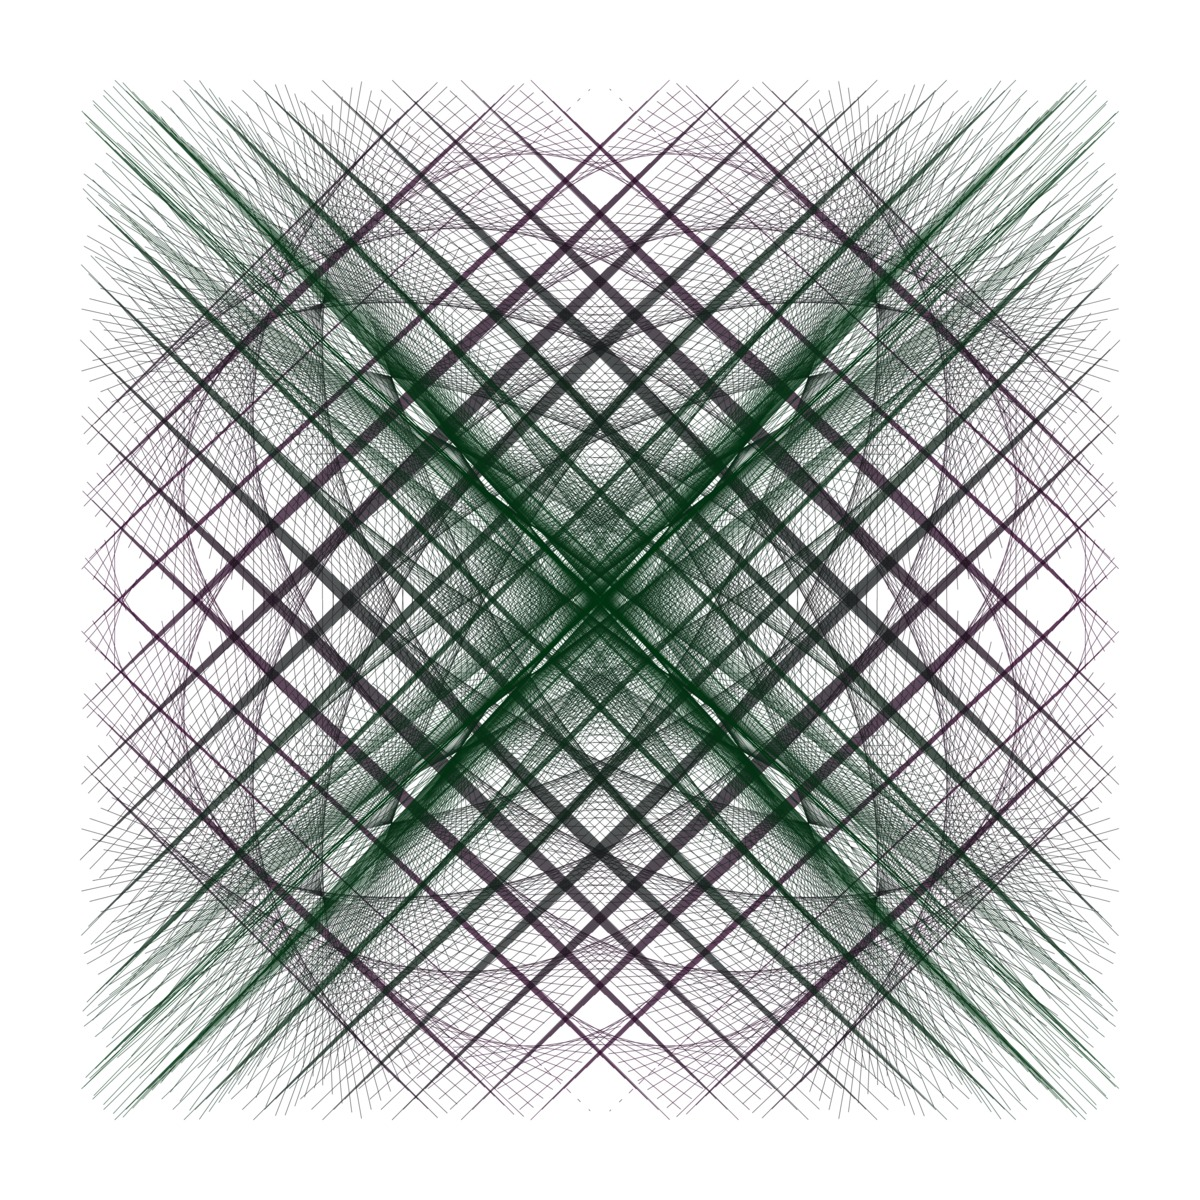 3000_Line_Segments